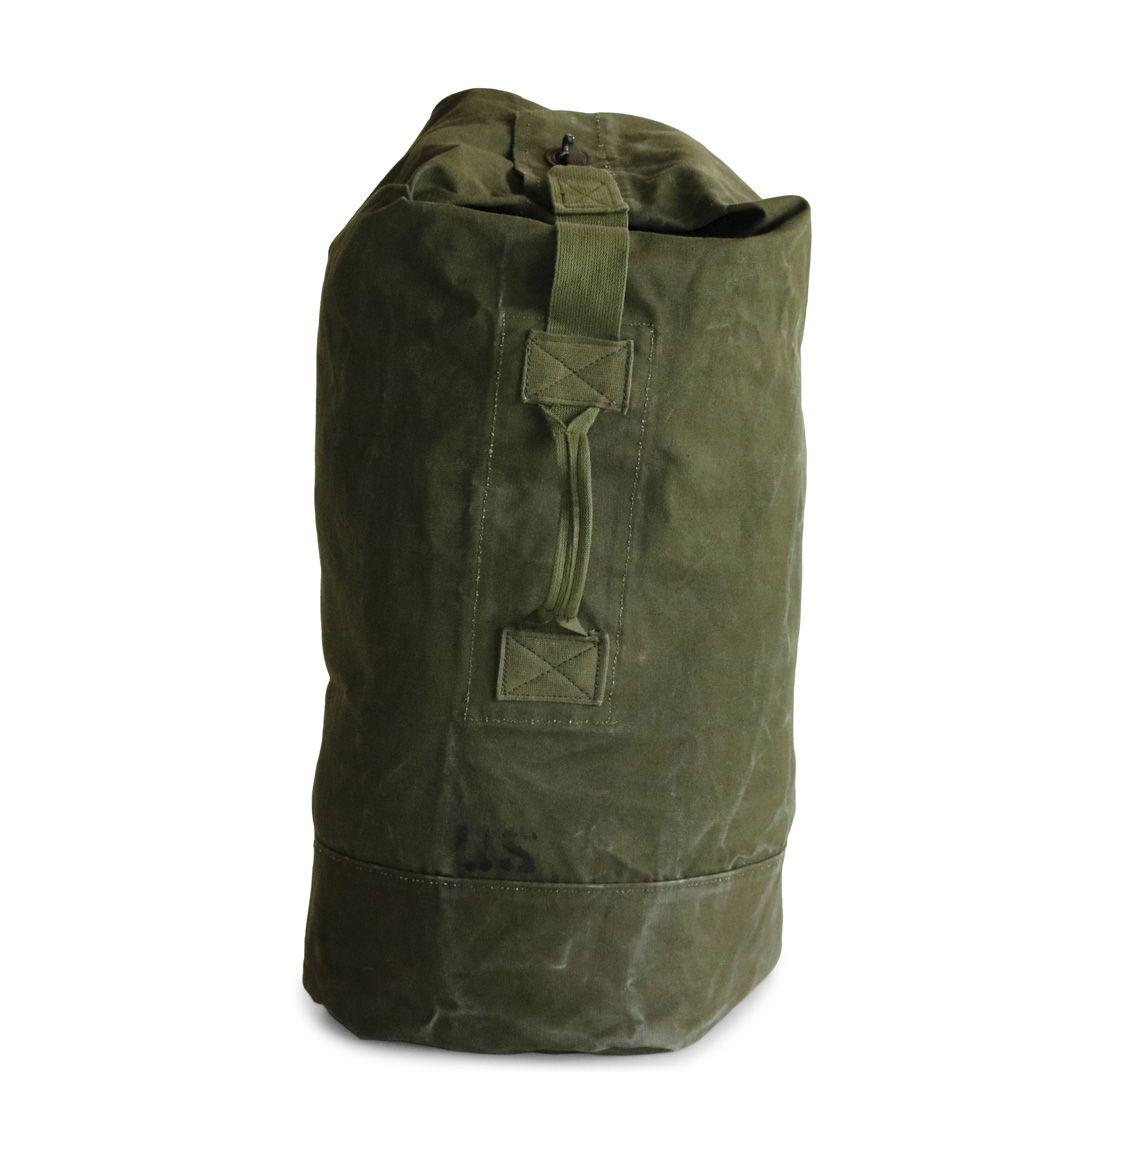 121235b557c7 U.S. Army Green Duffle Bag